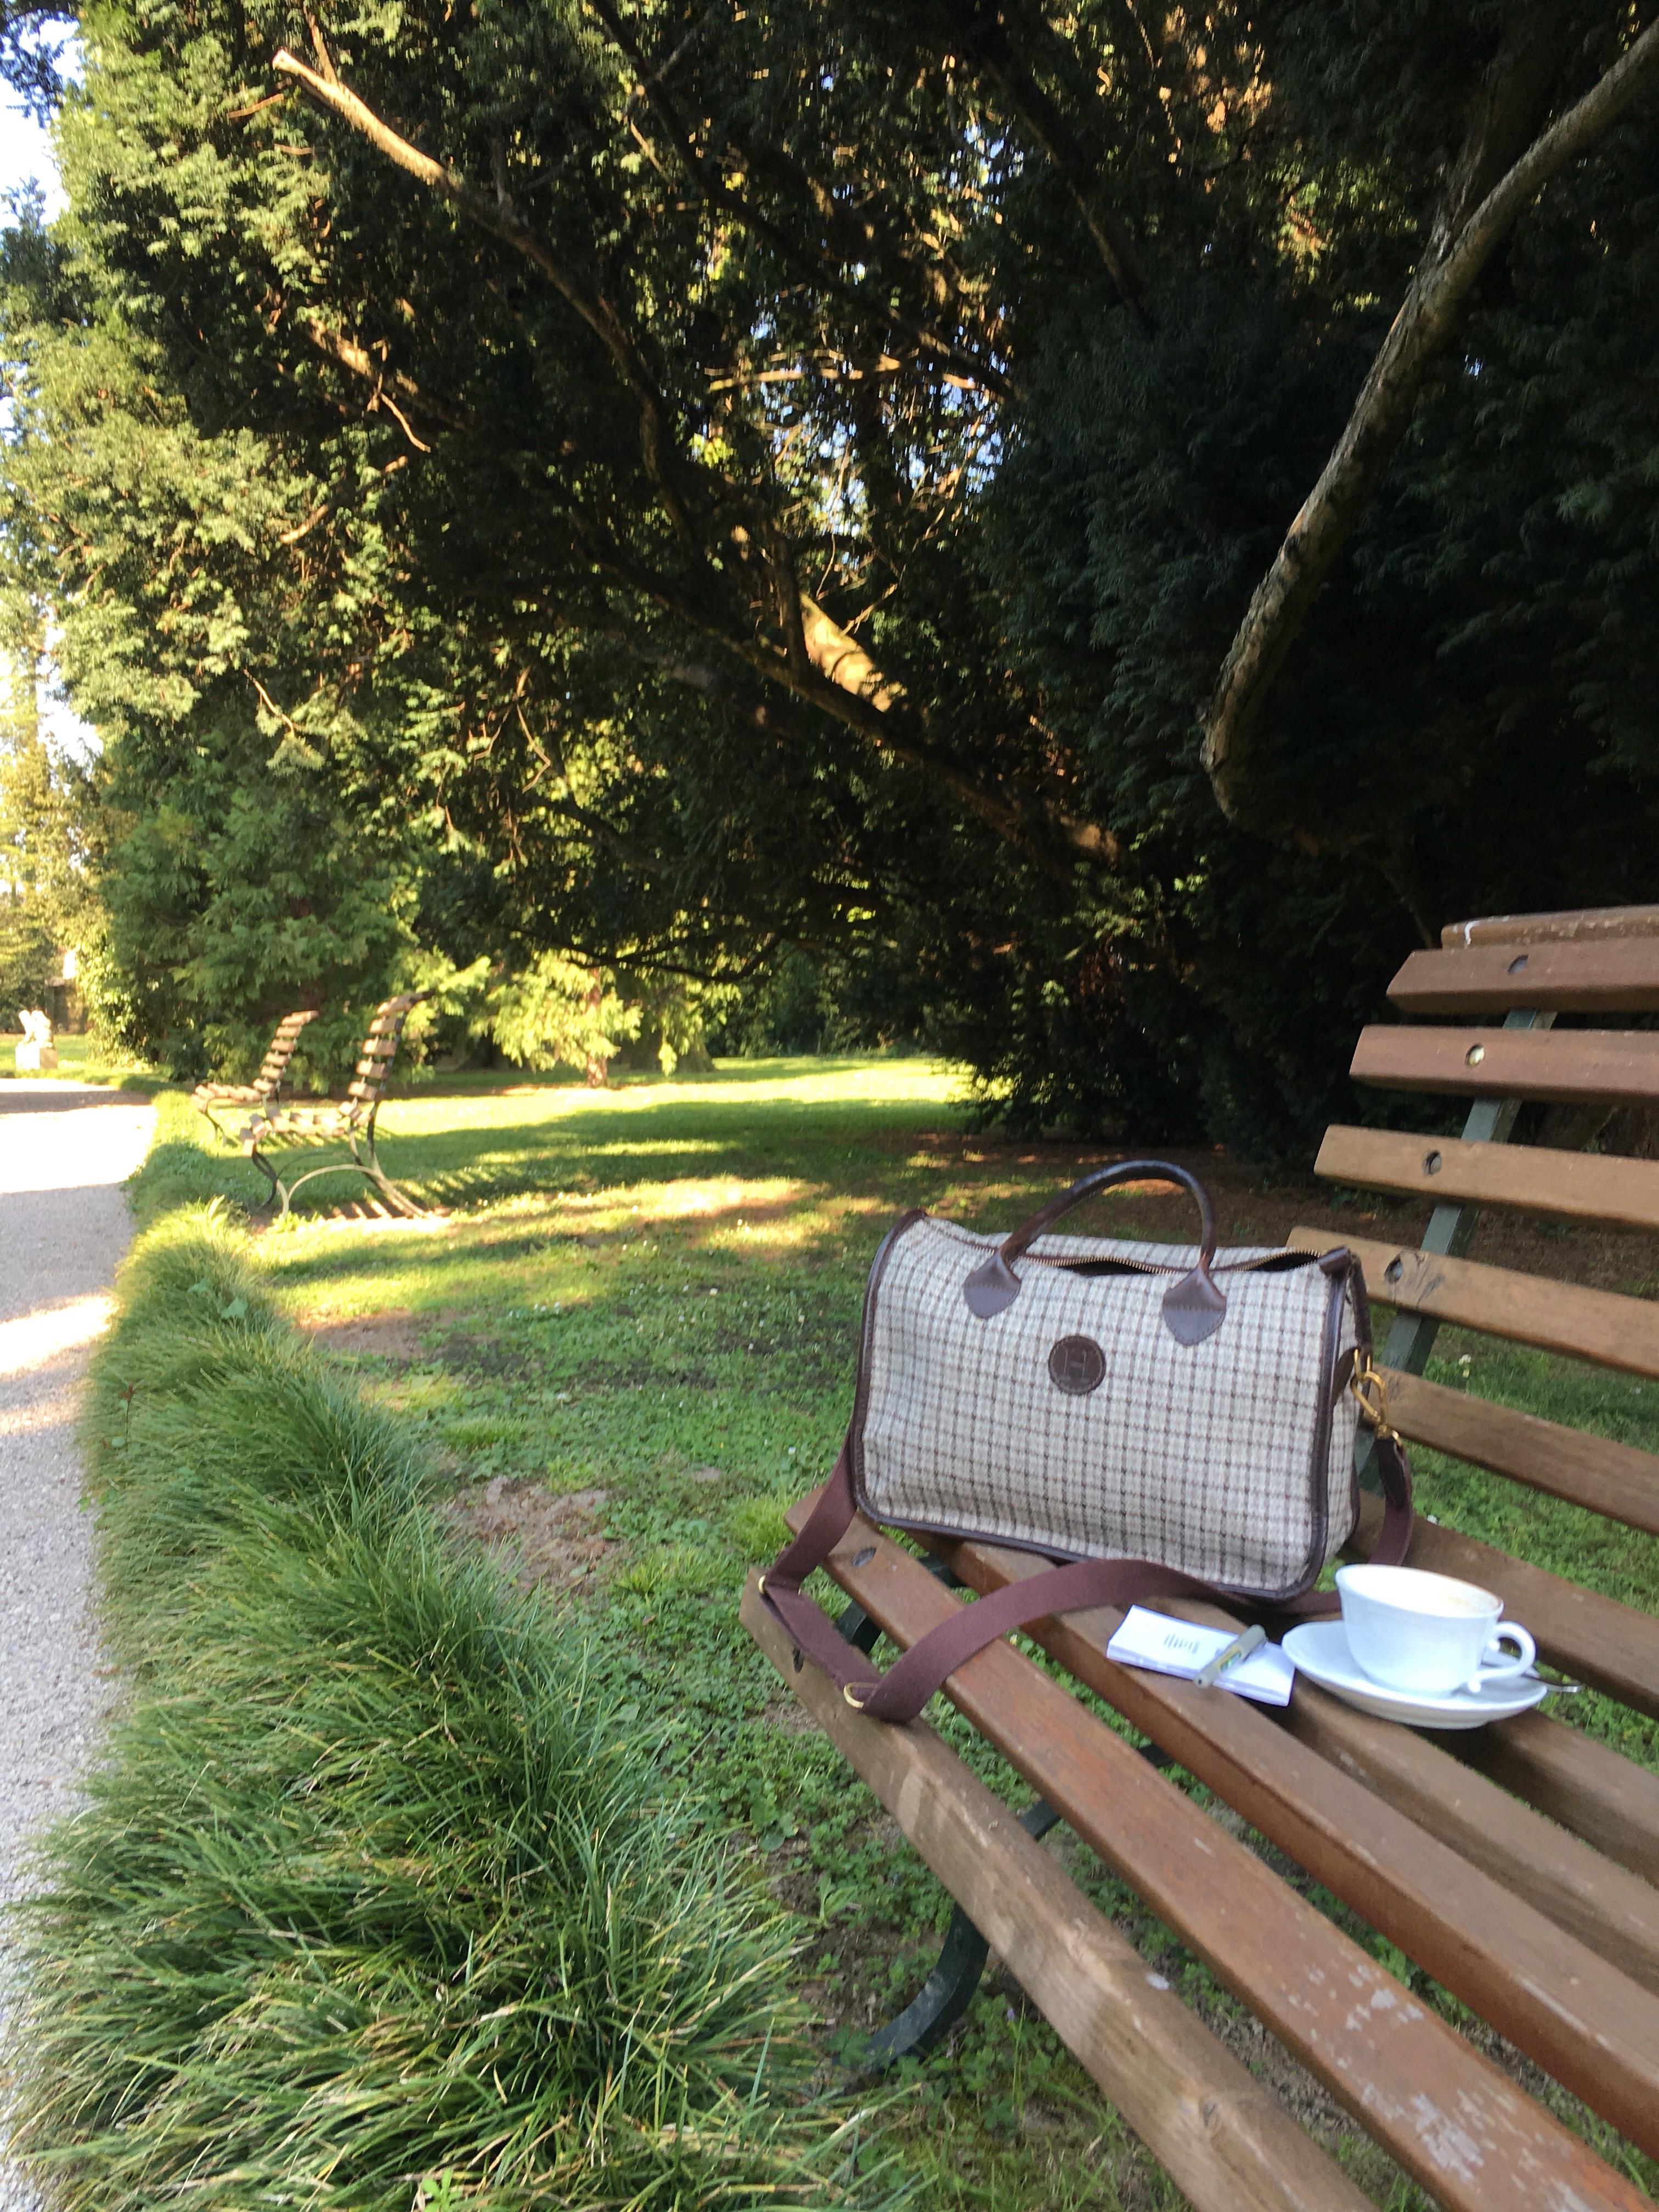 The Herdwick Handbag - hard at work in the Veneto, Villa Franceschi Garden - April 2017